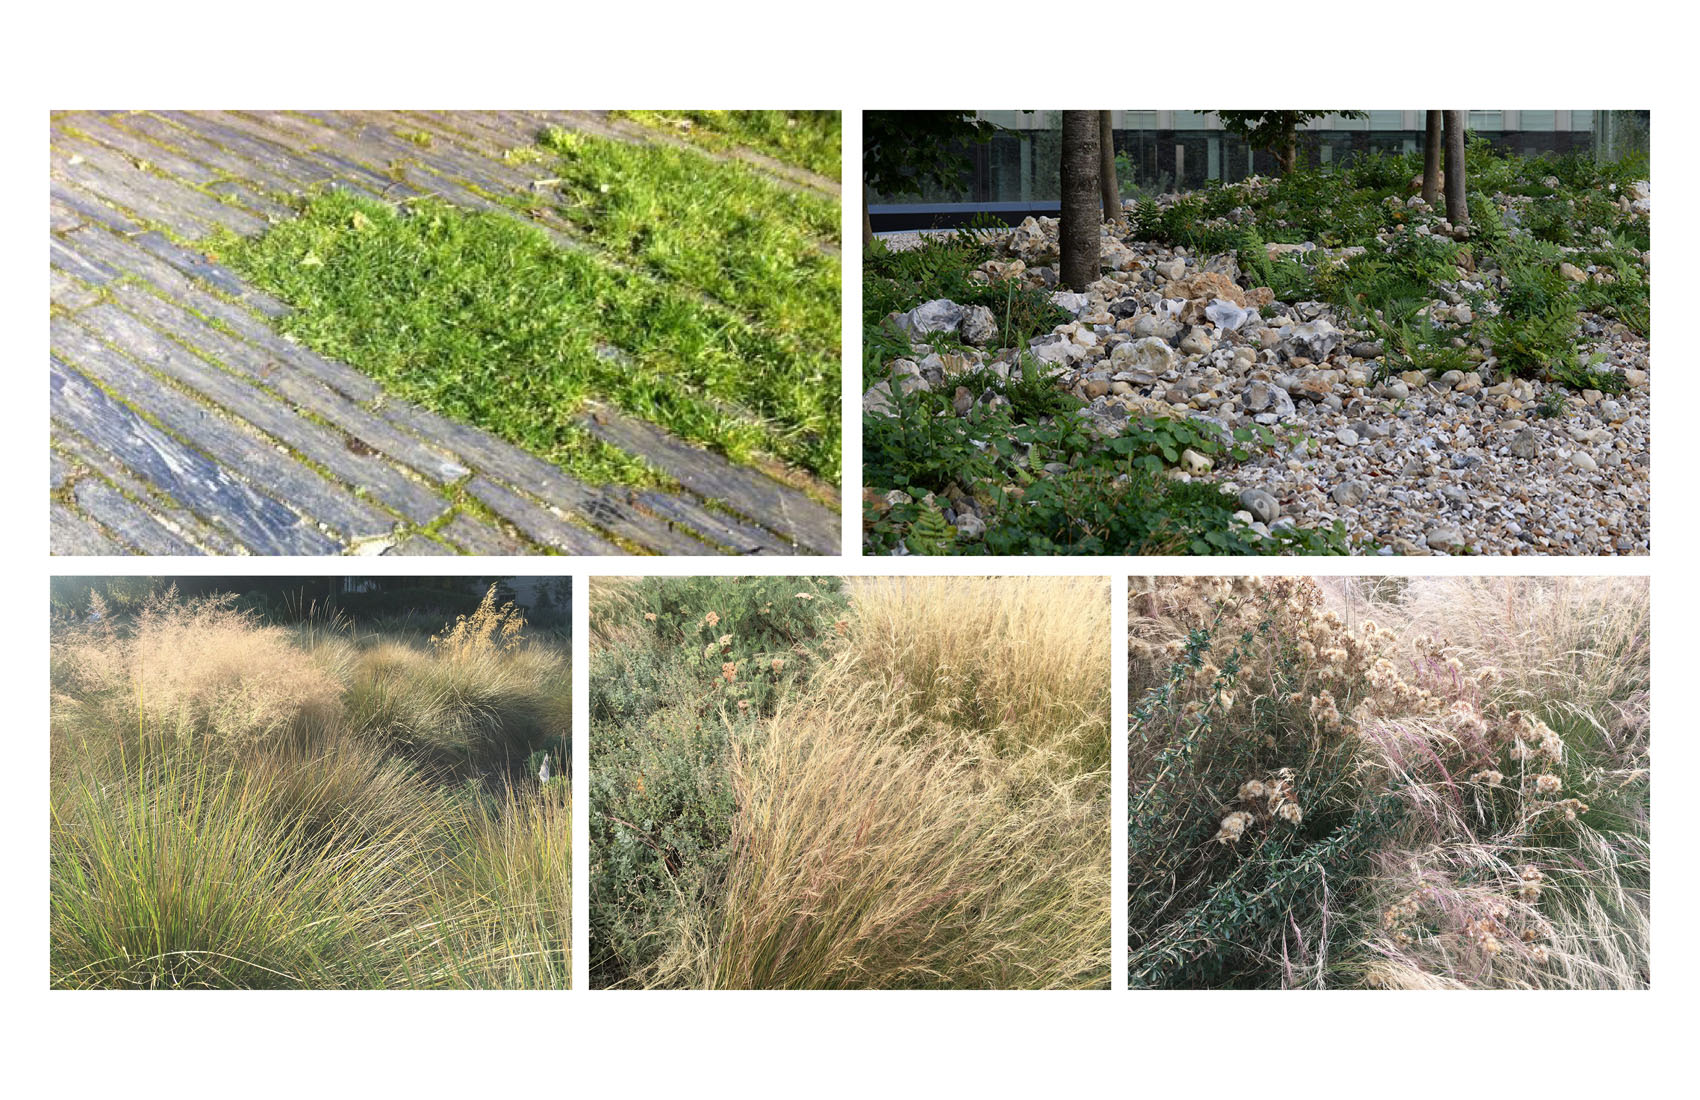 TINA CHEE landscape studio-ref images 1.jpg